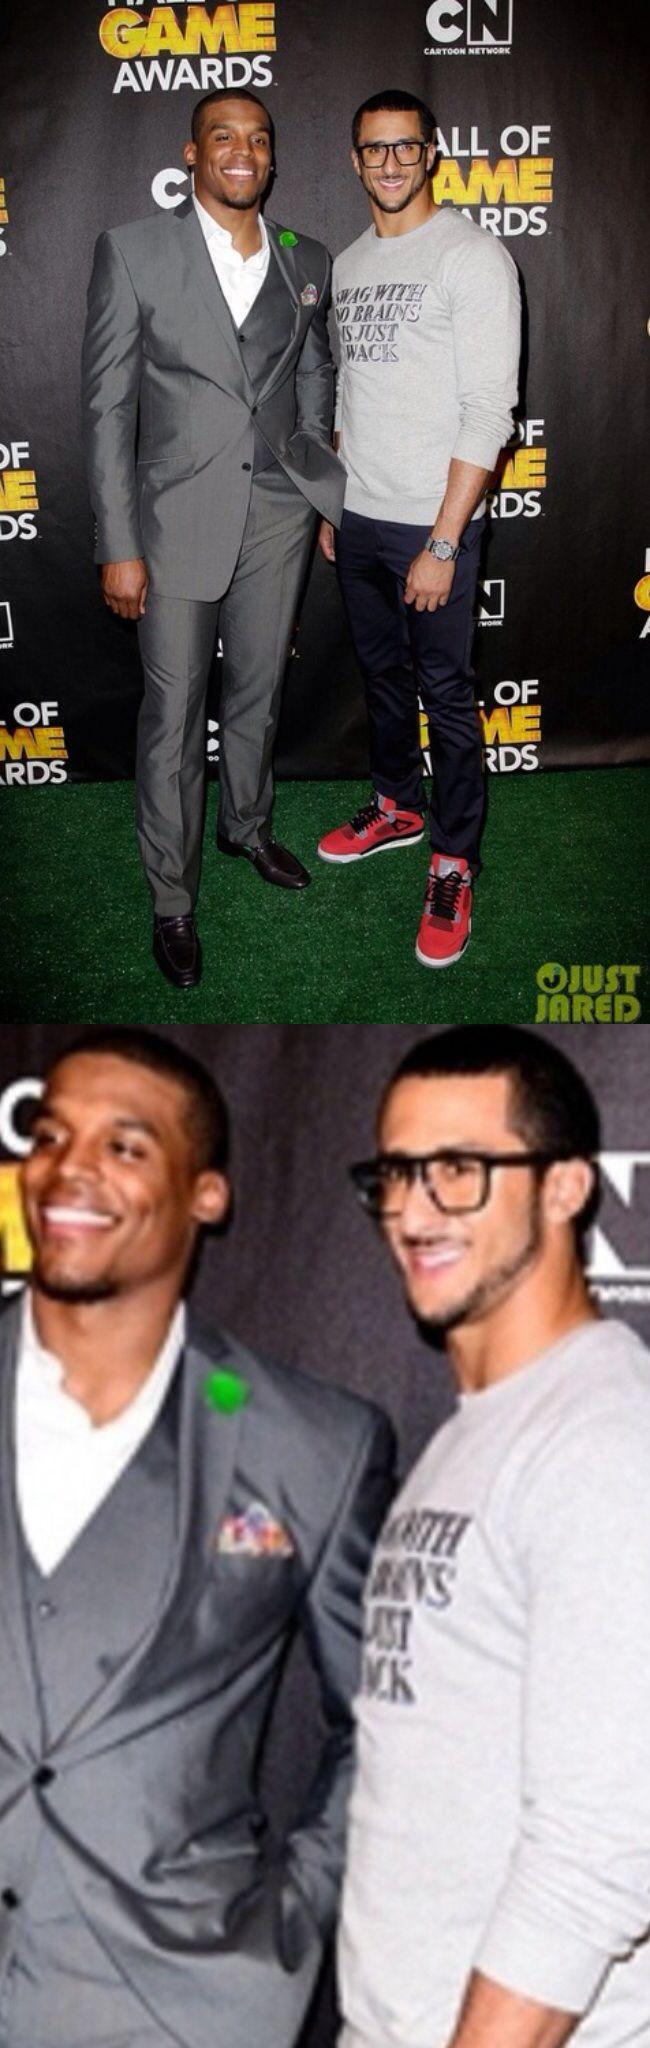 Colin Kaepernick & cam newton. His Jordan's tho.